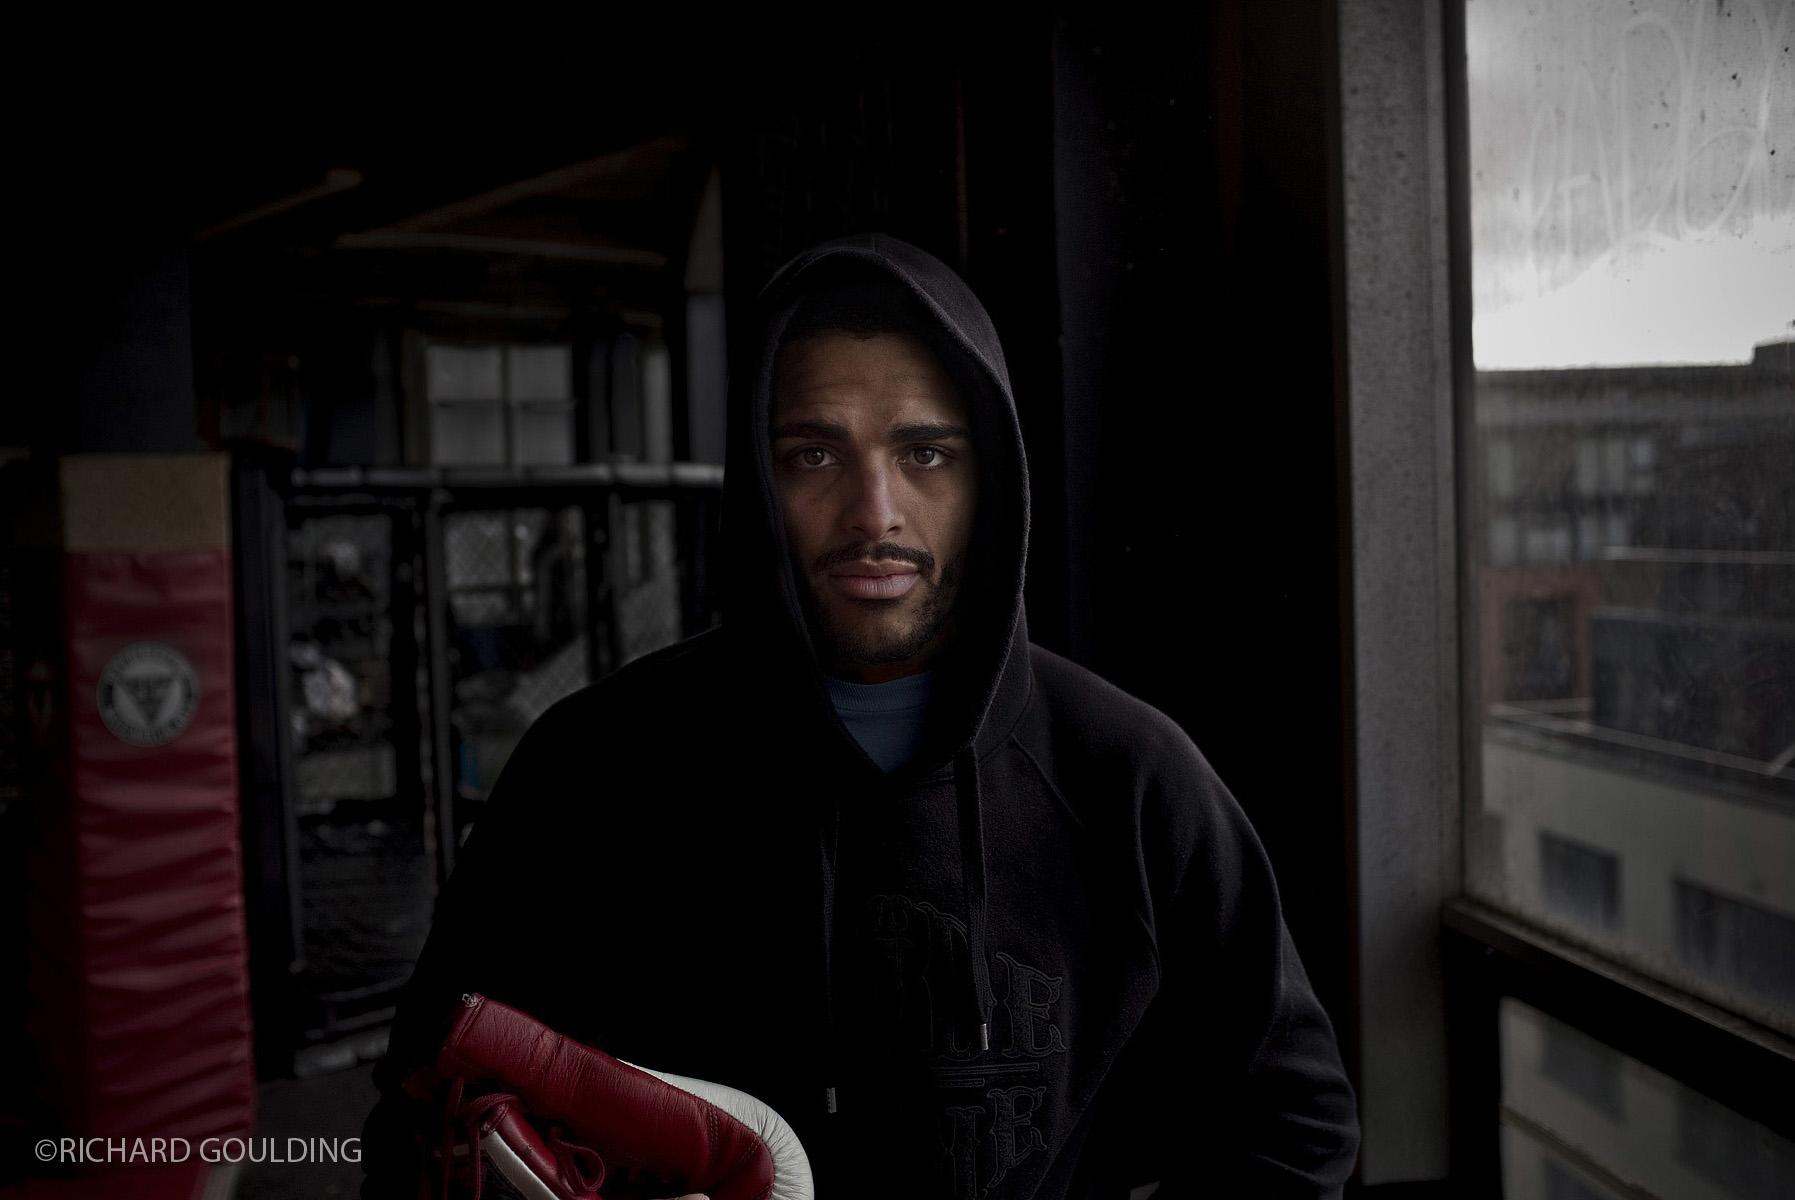 richard goulding sport photographer_SQ_08.jpg